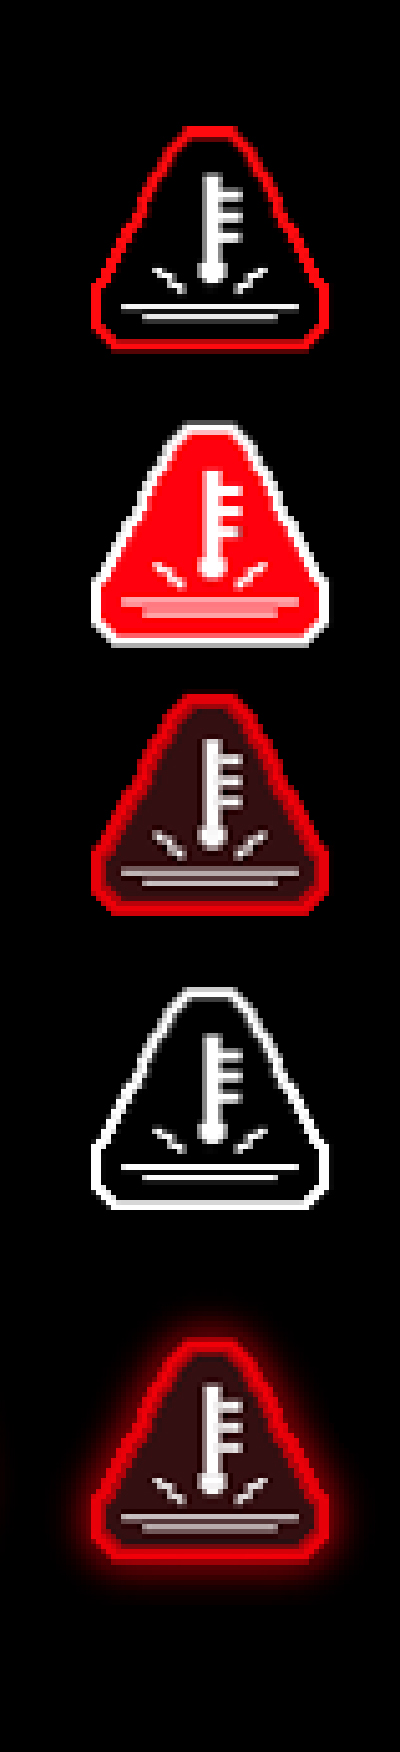 SF CAR Alert Lights by kekuha